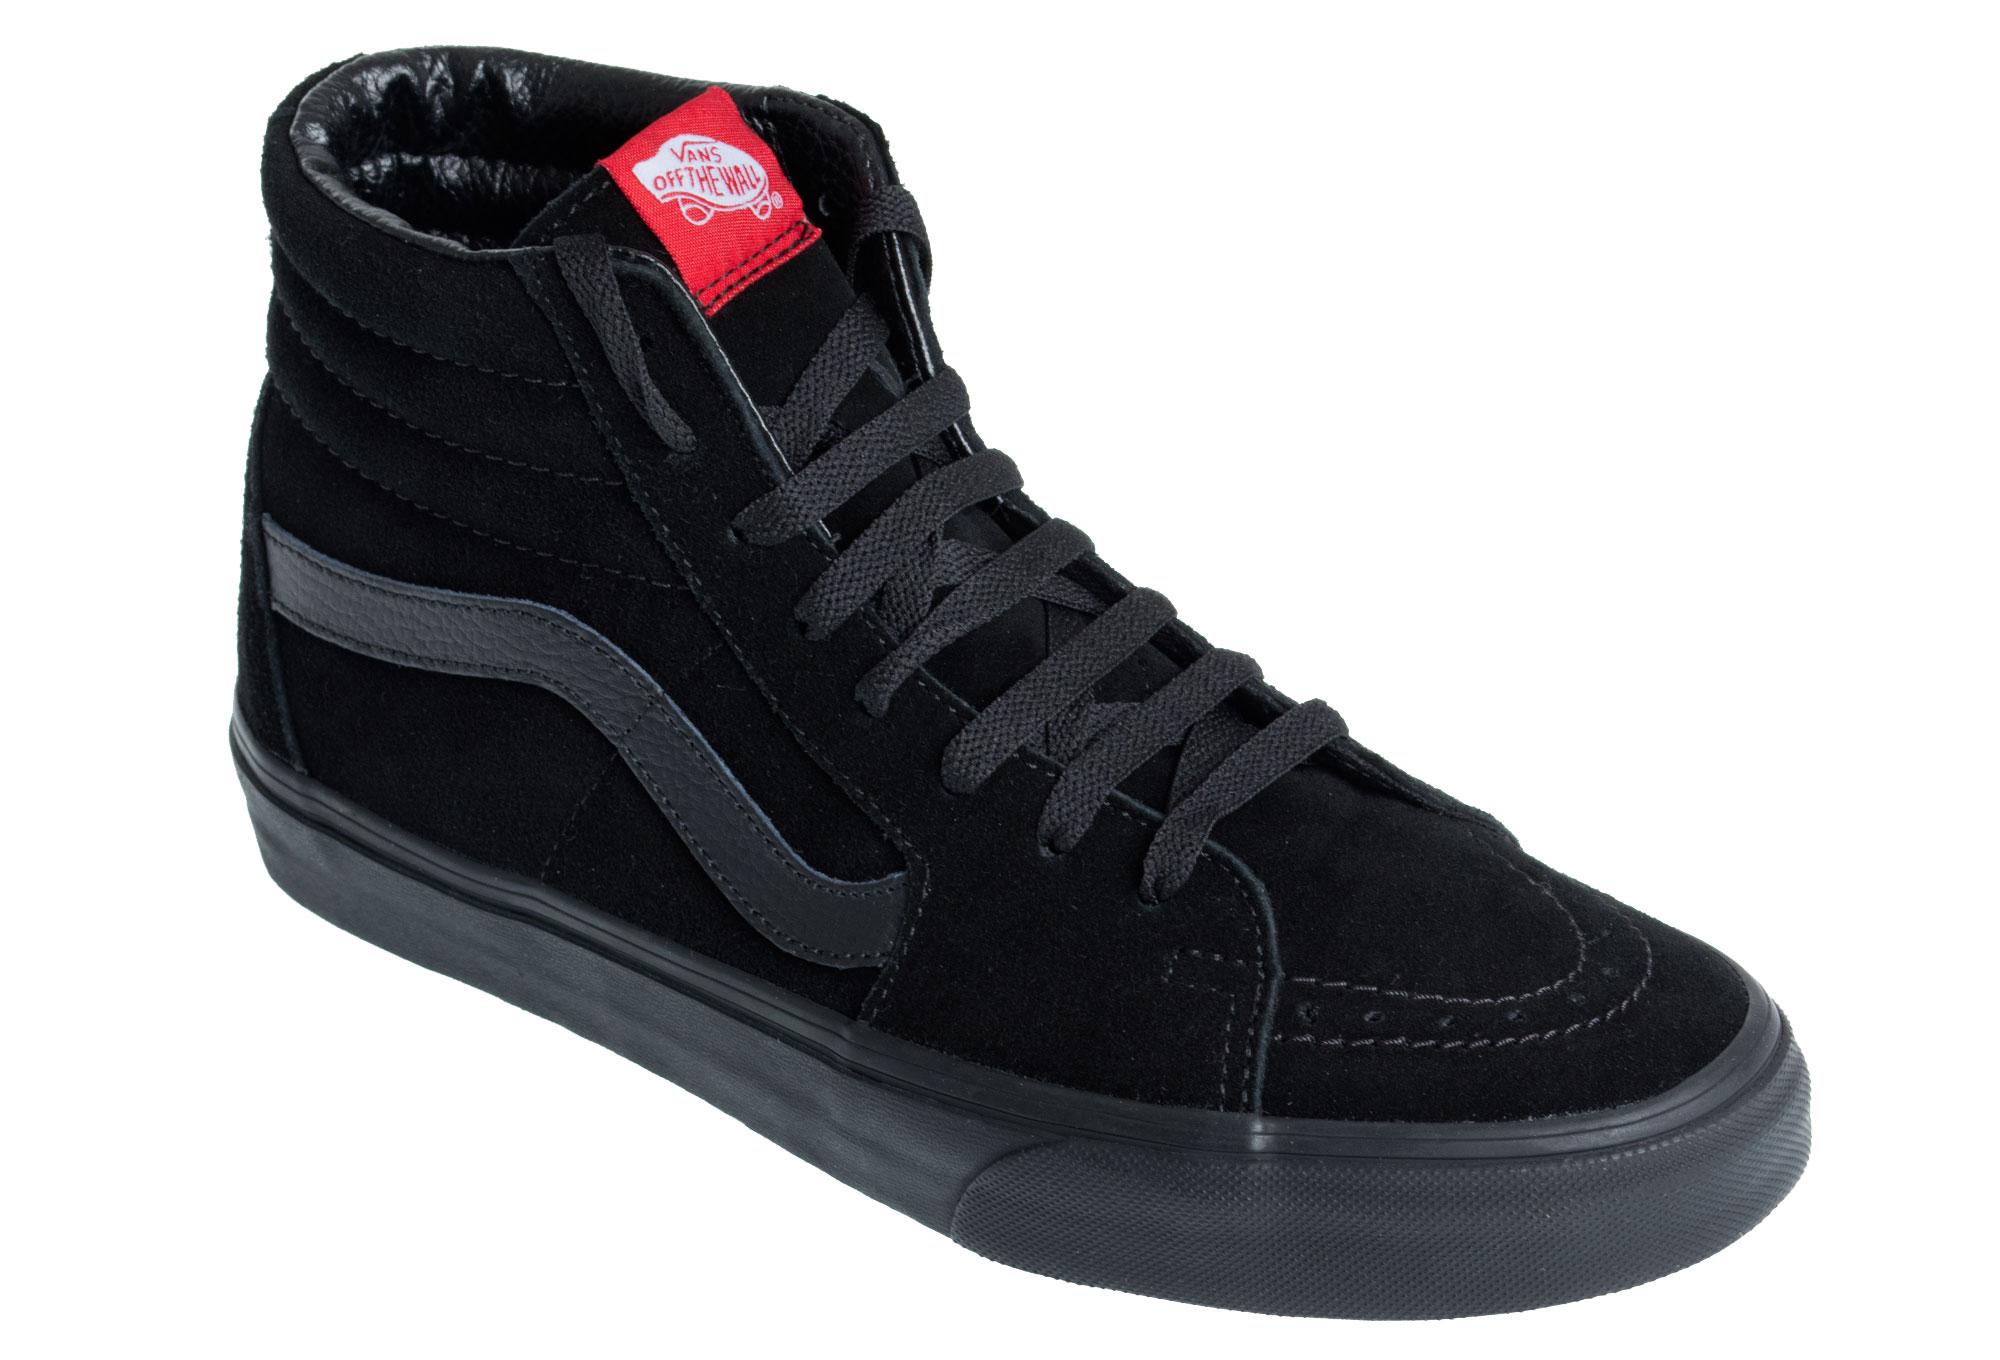 De Paire Hi Noir Vans Sk8 Chaussures vmwON8yn0